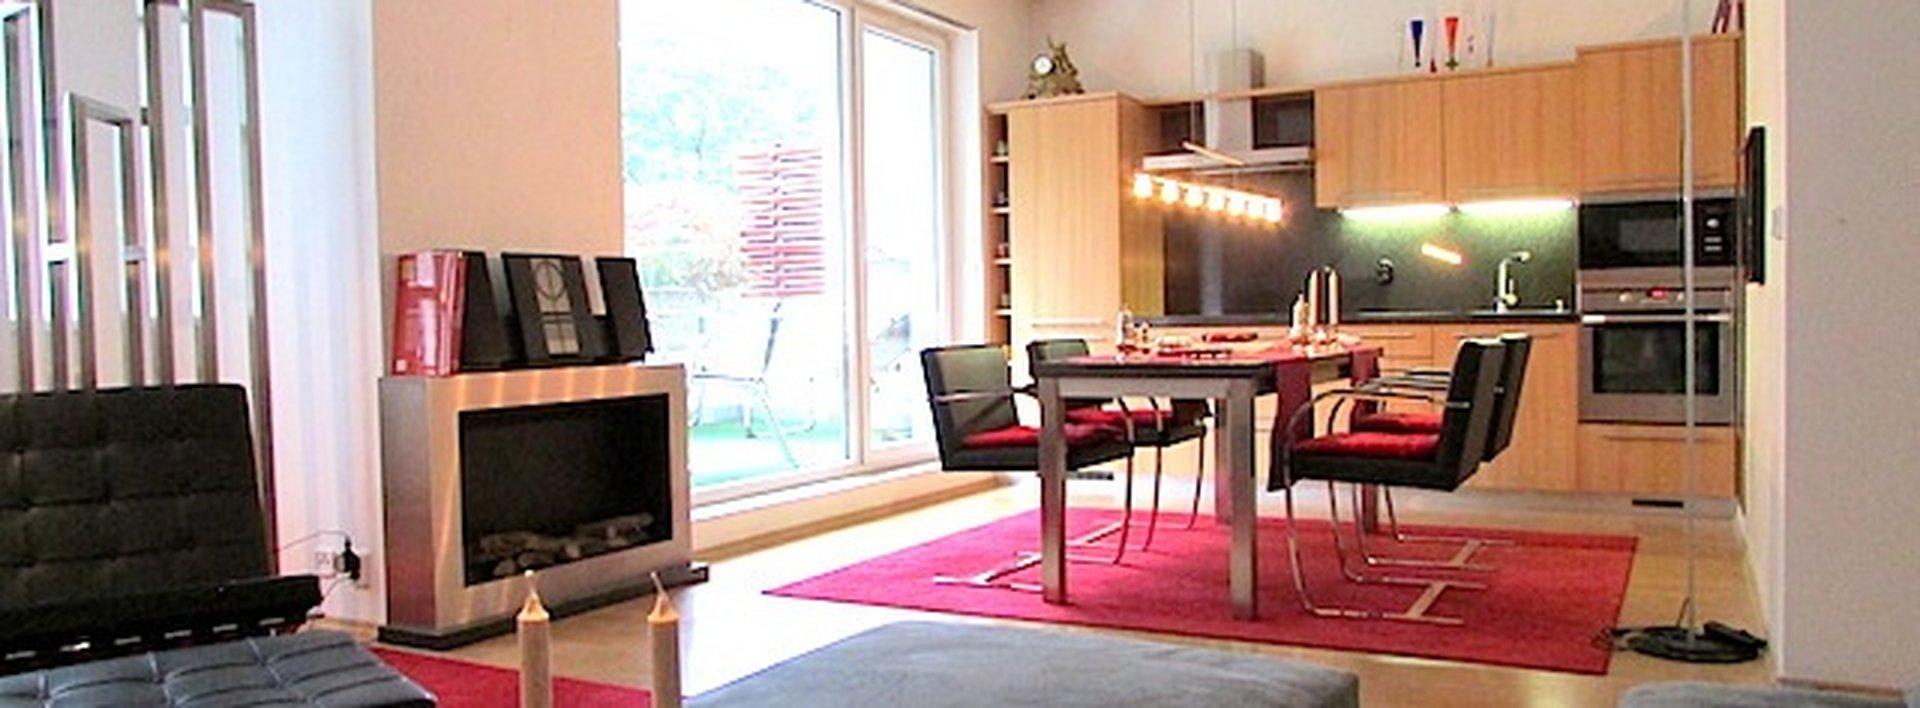 Prodej slunného bytu 3+KK s terasou - Liberec, Perštýn, Ev.č.: N47765